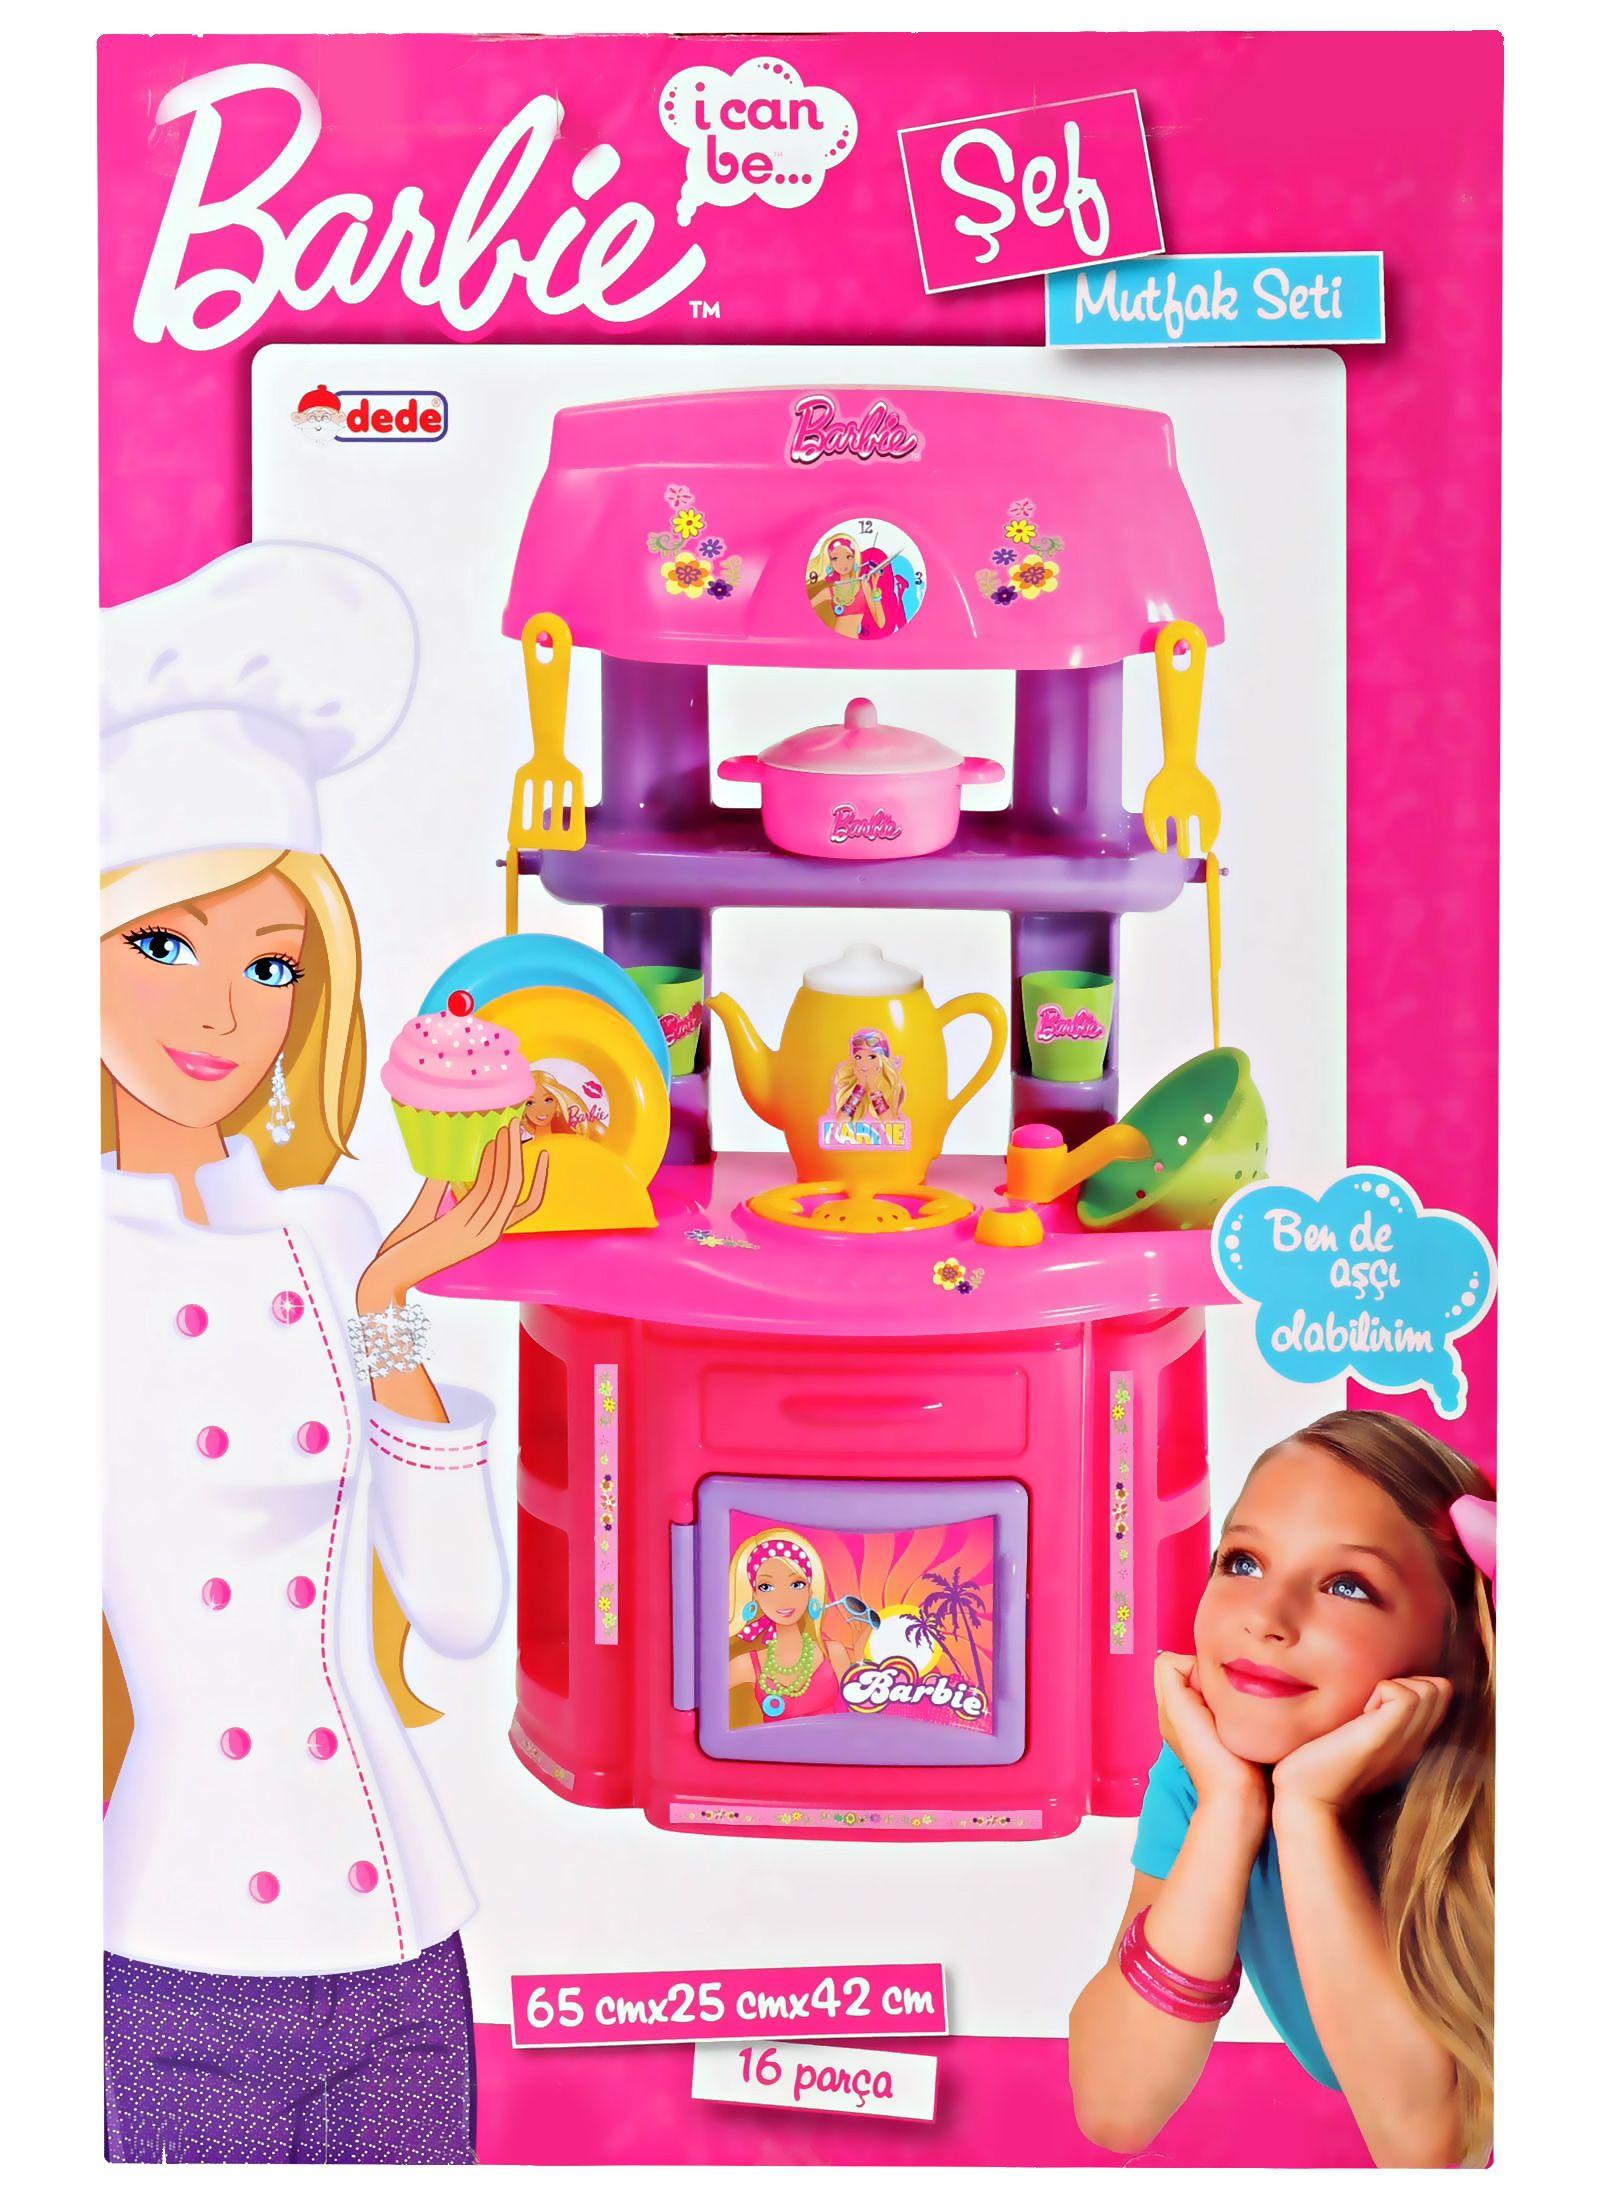 Barbie doll kitchen set online shopping india for Barbie kitchen set 90s